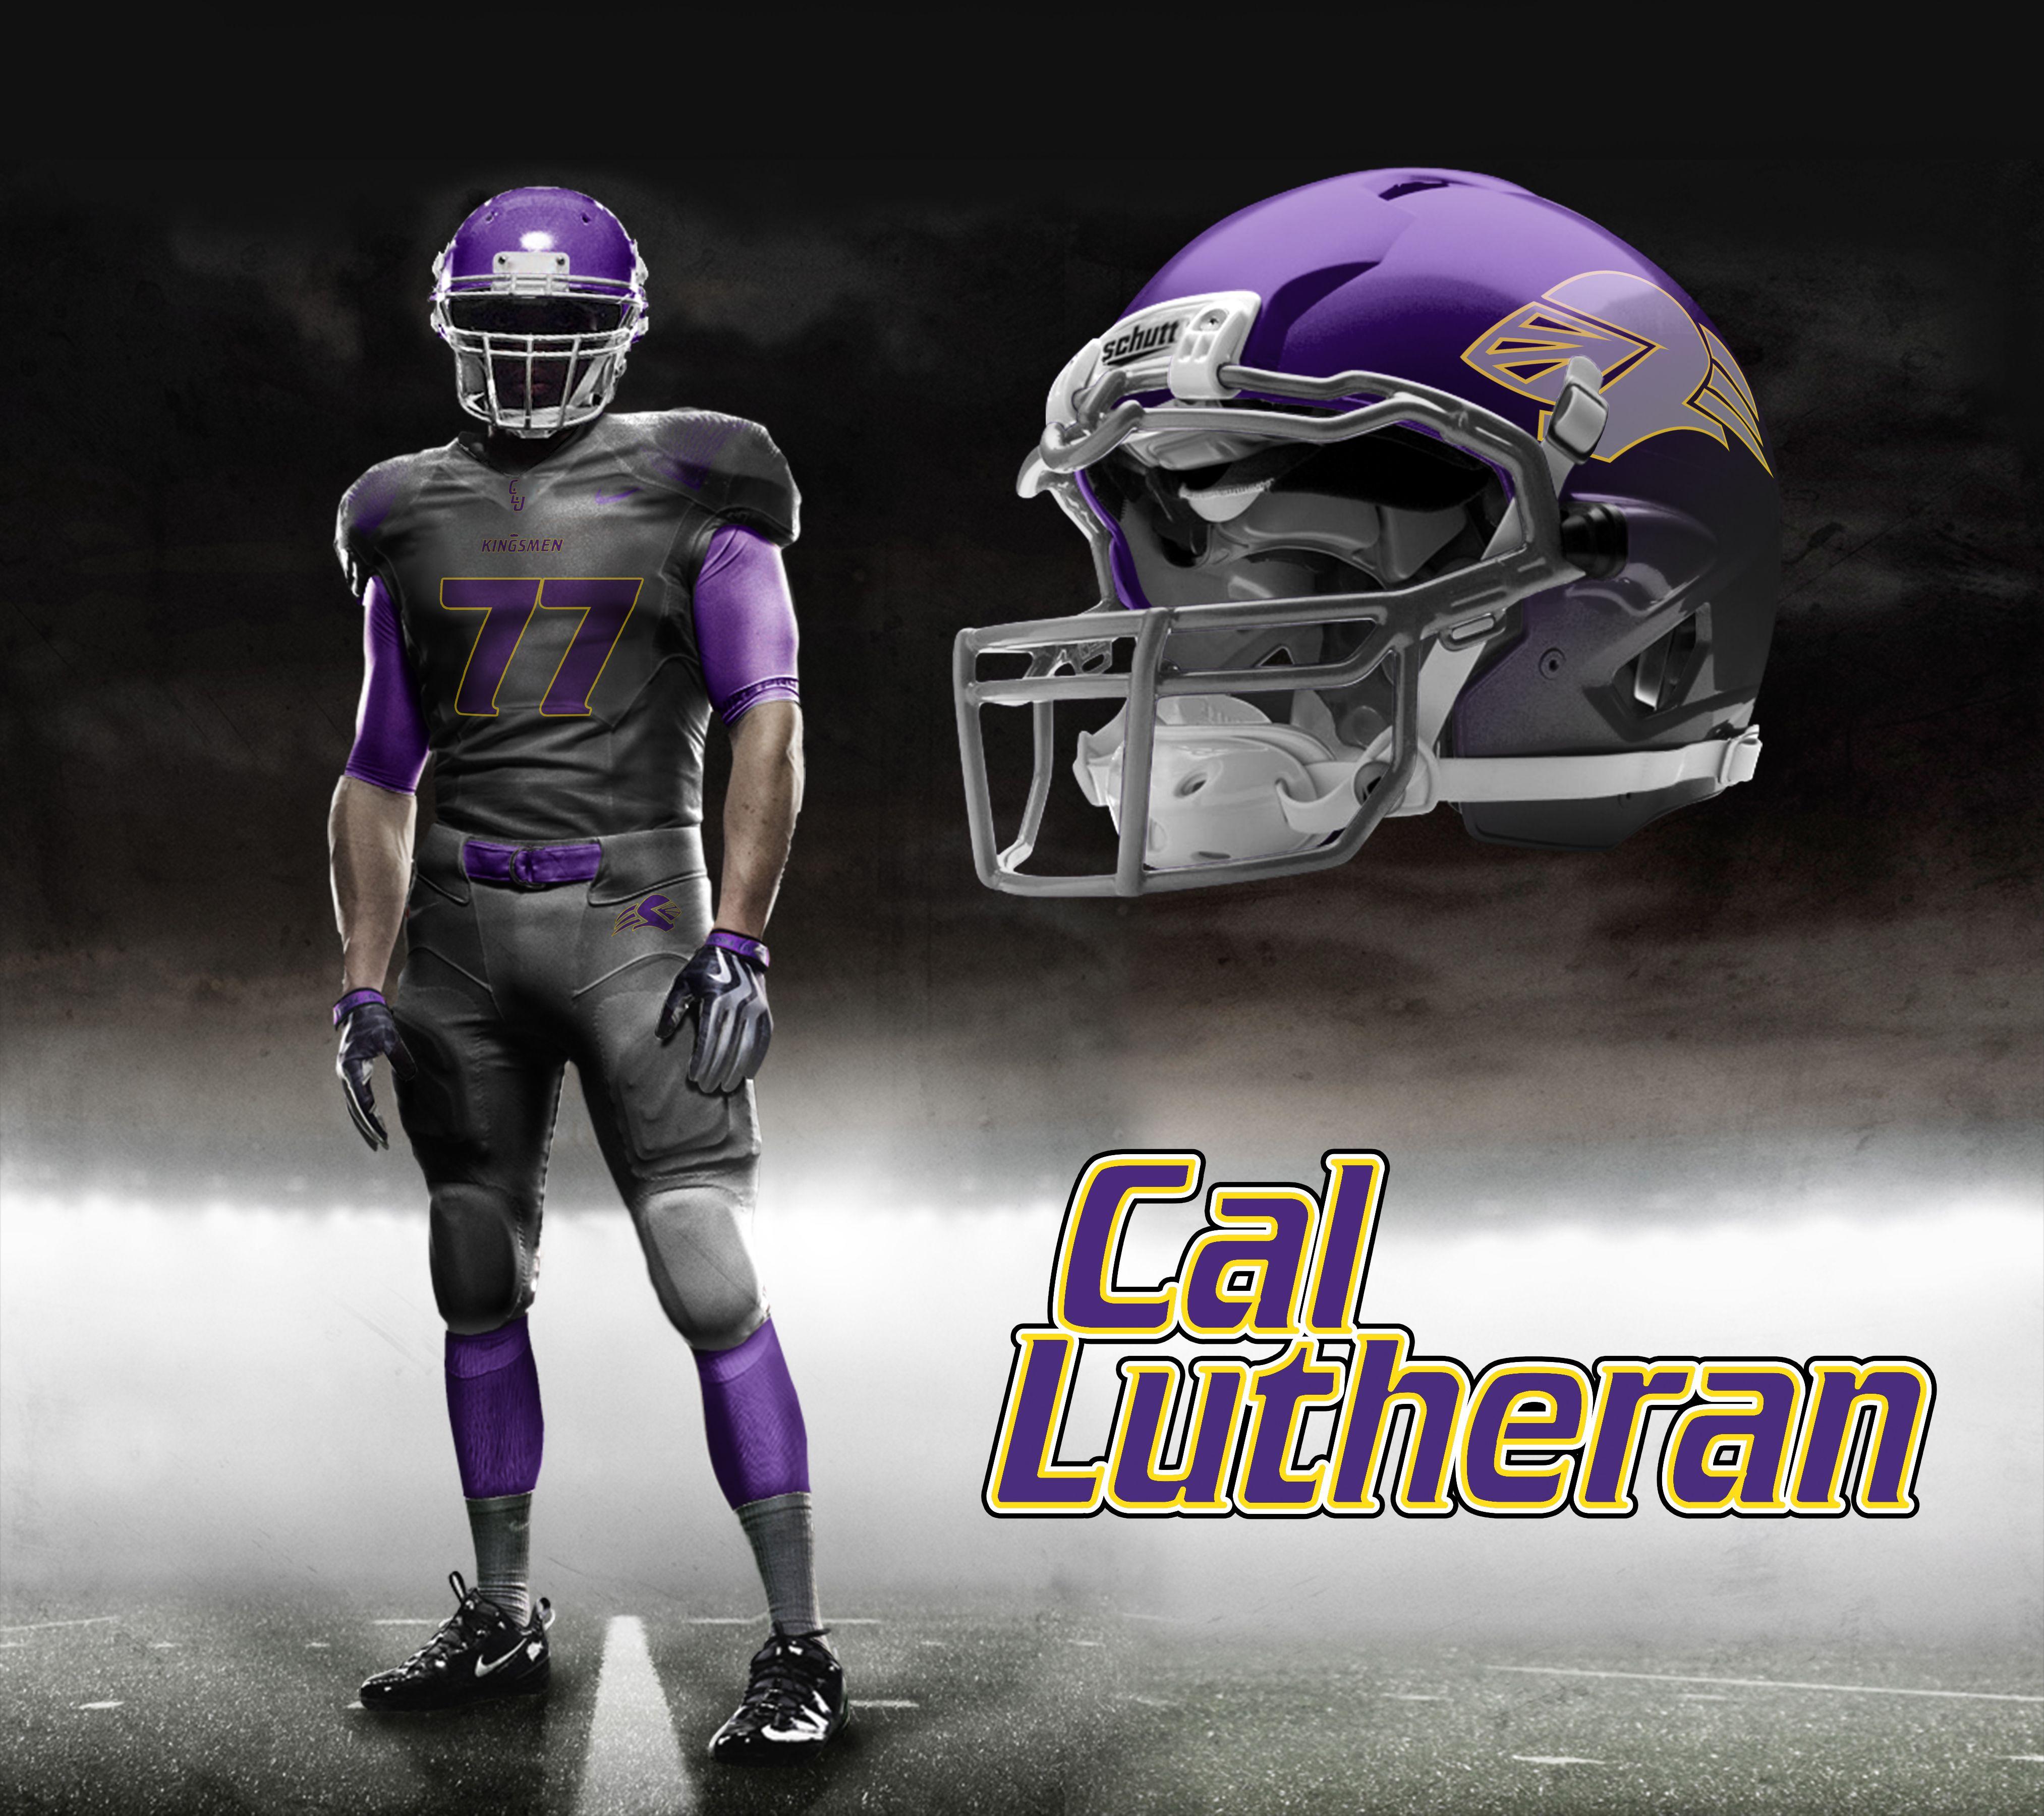 2014 Cal Lutheran Nike Pro Combat Uniforms Nike Pro Combat Combat Uniforms Football Uniforms